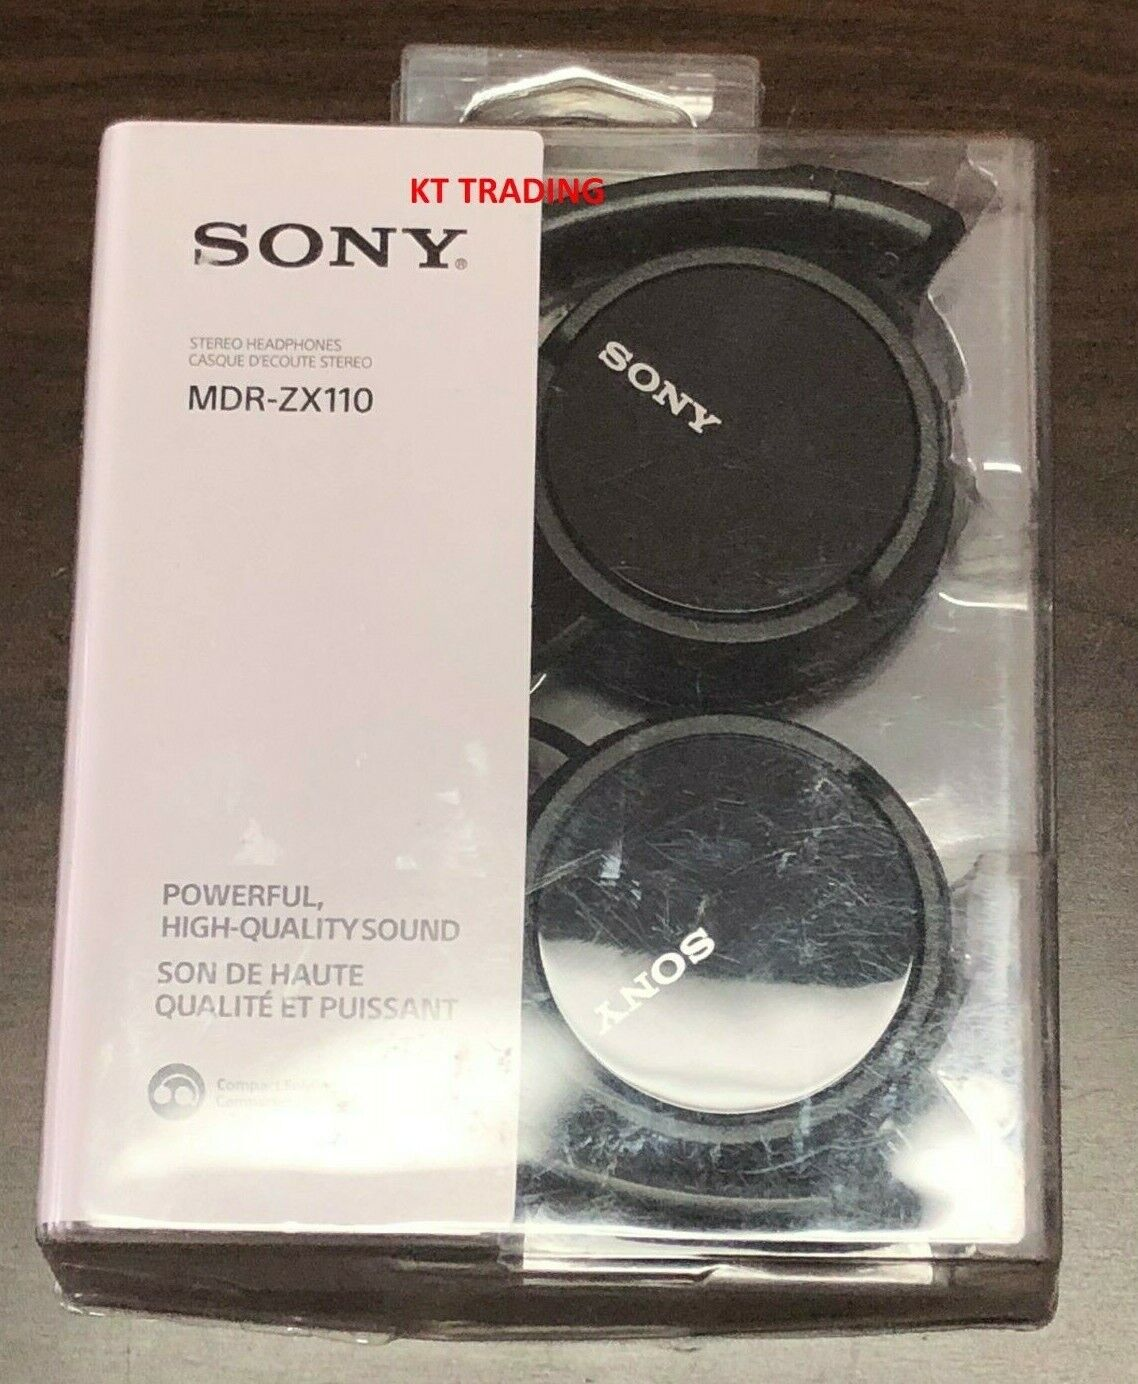 Sony Genuine MDRZX110 Stereo On ear Swivel Headphones  MDRZX110  Black